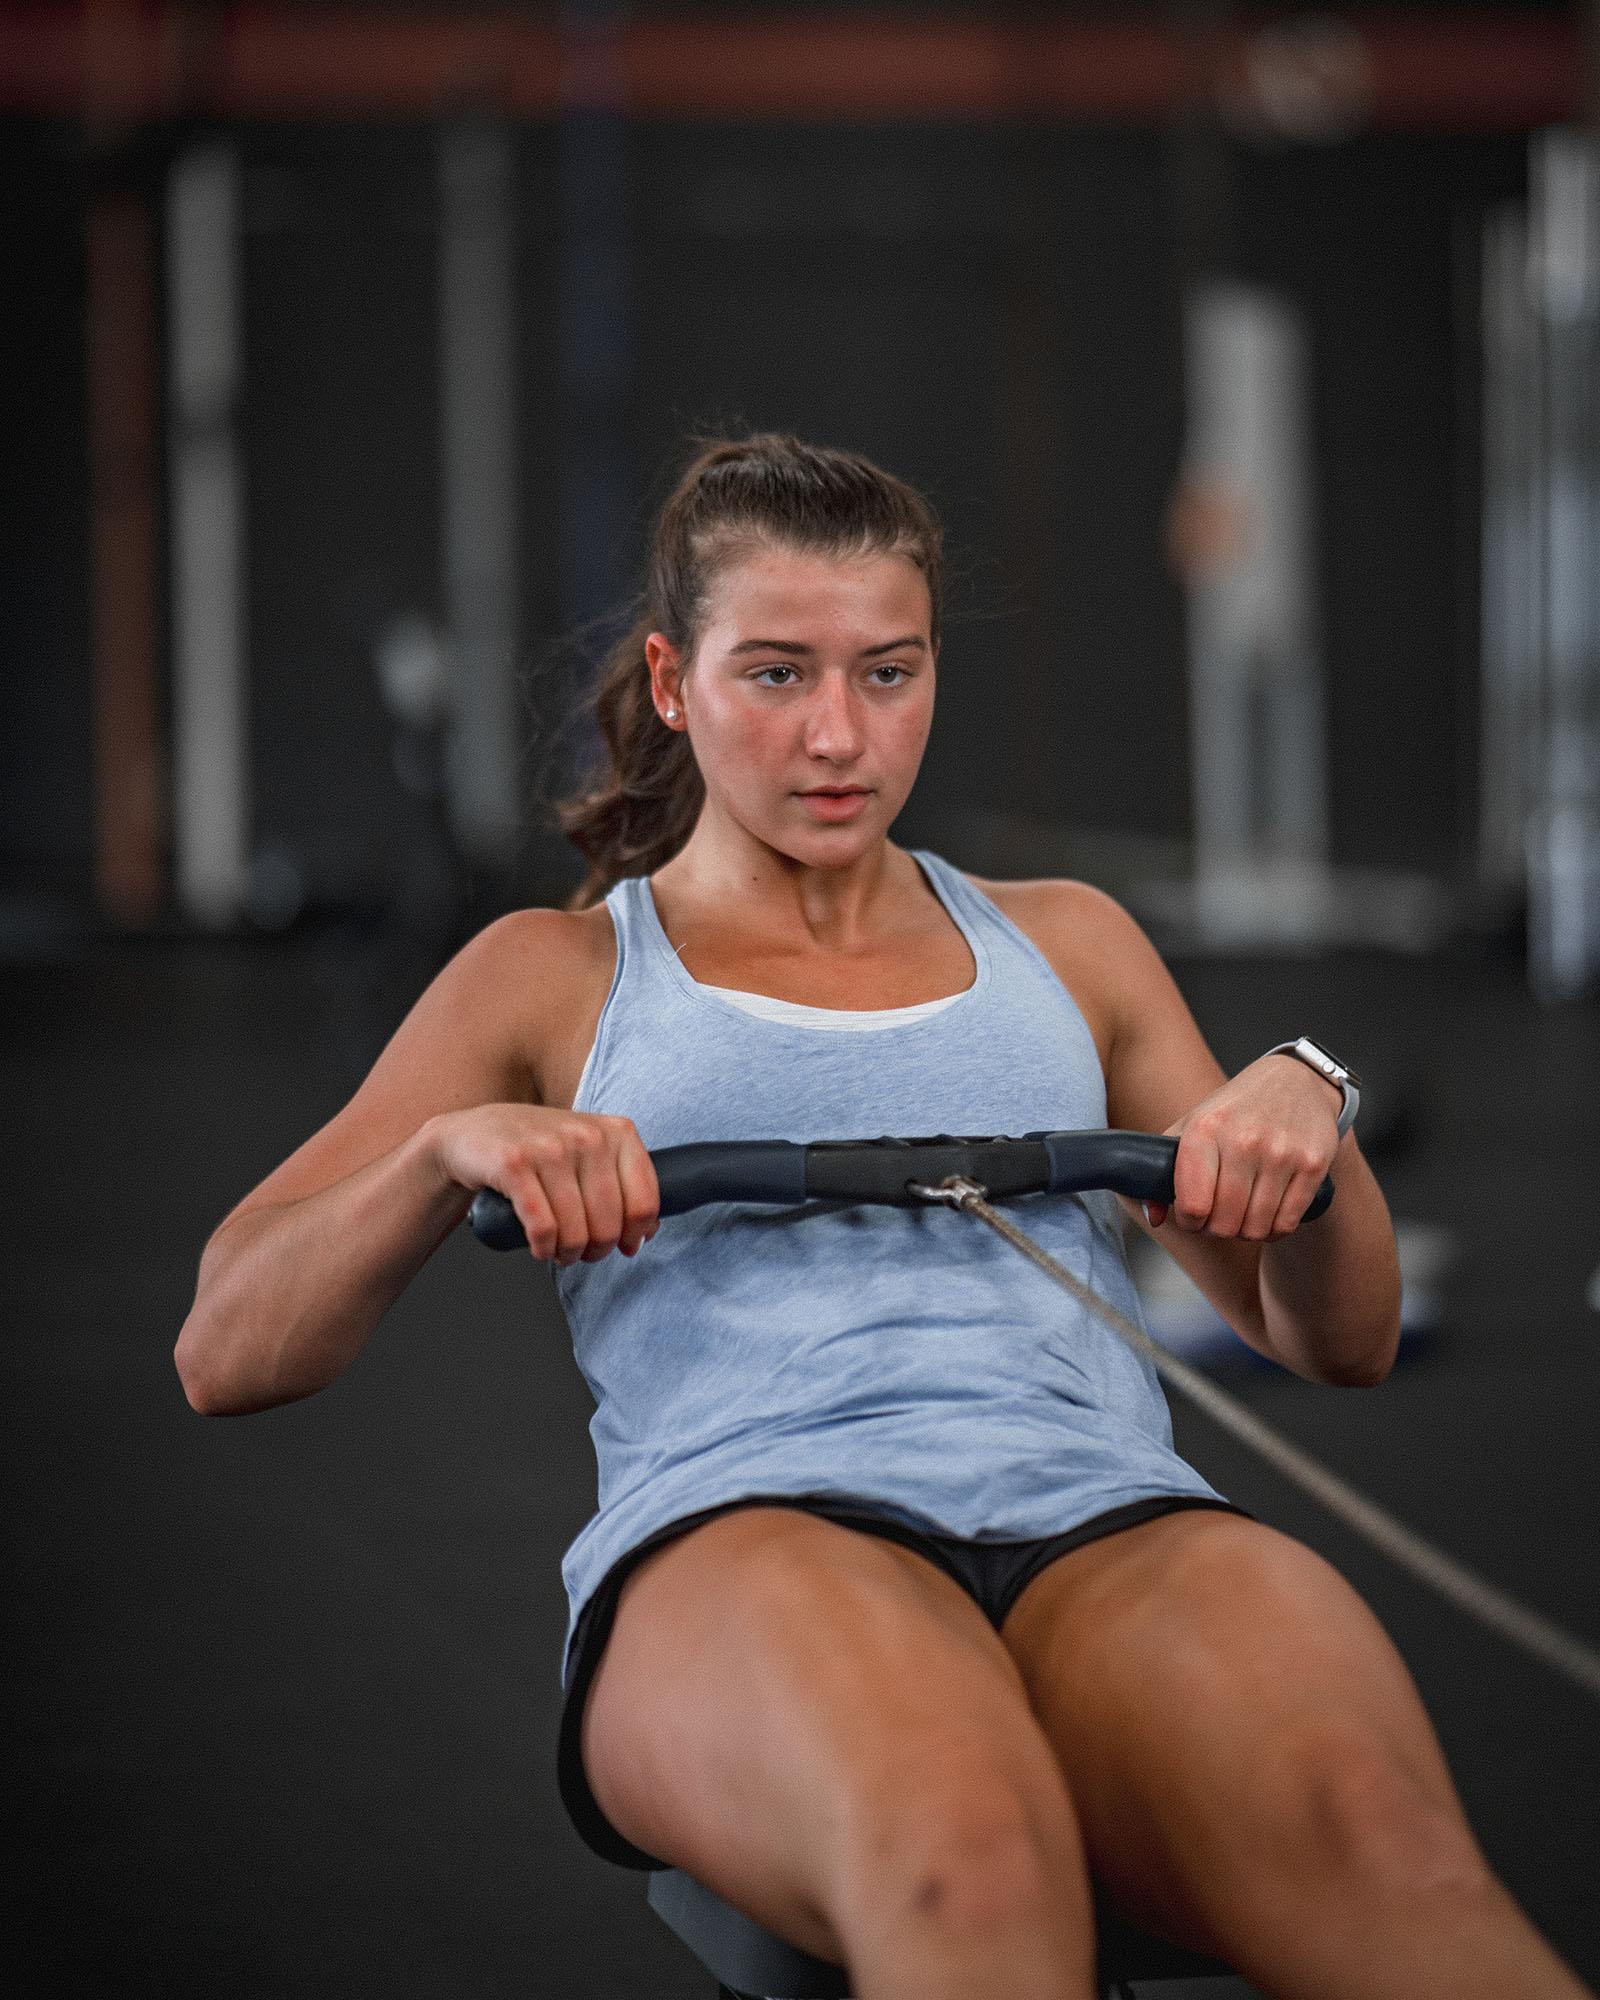 woman doing aerobic workouts